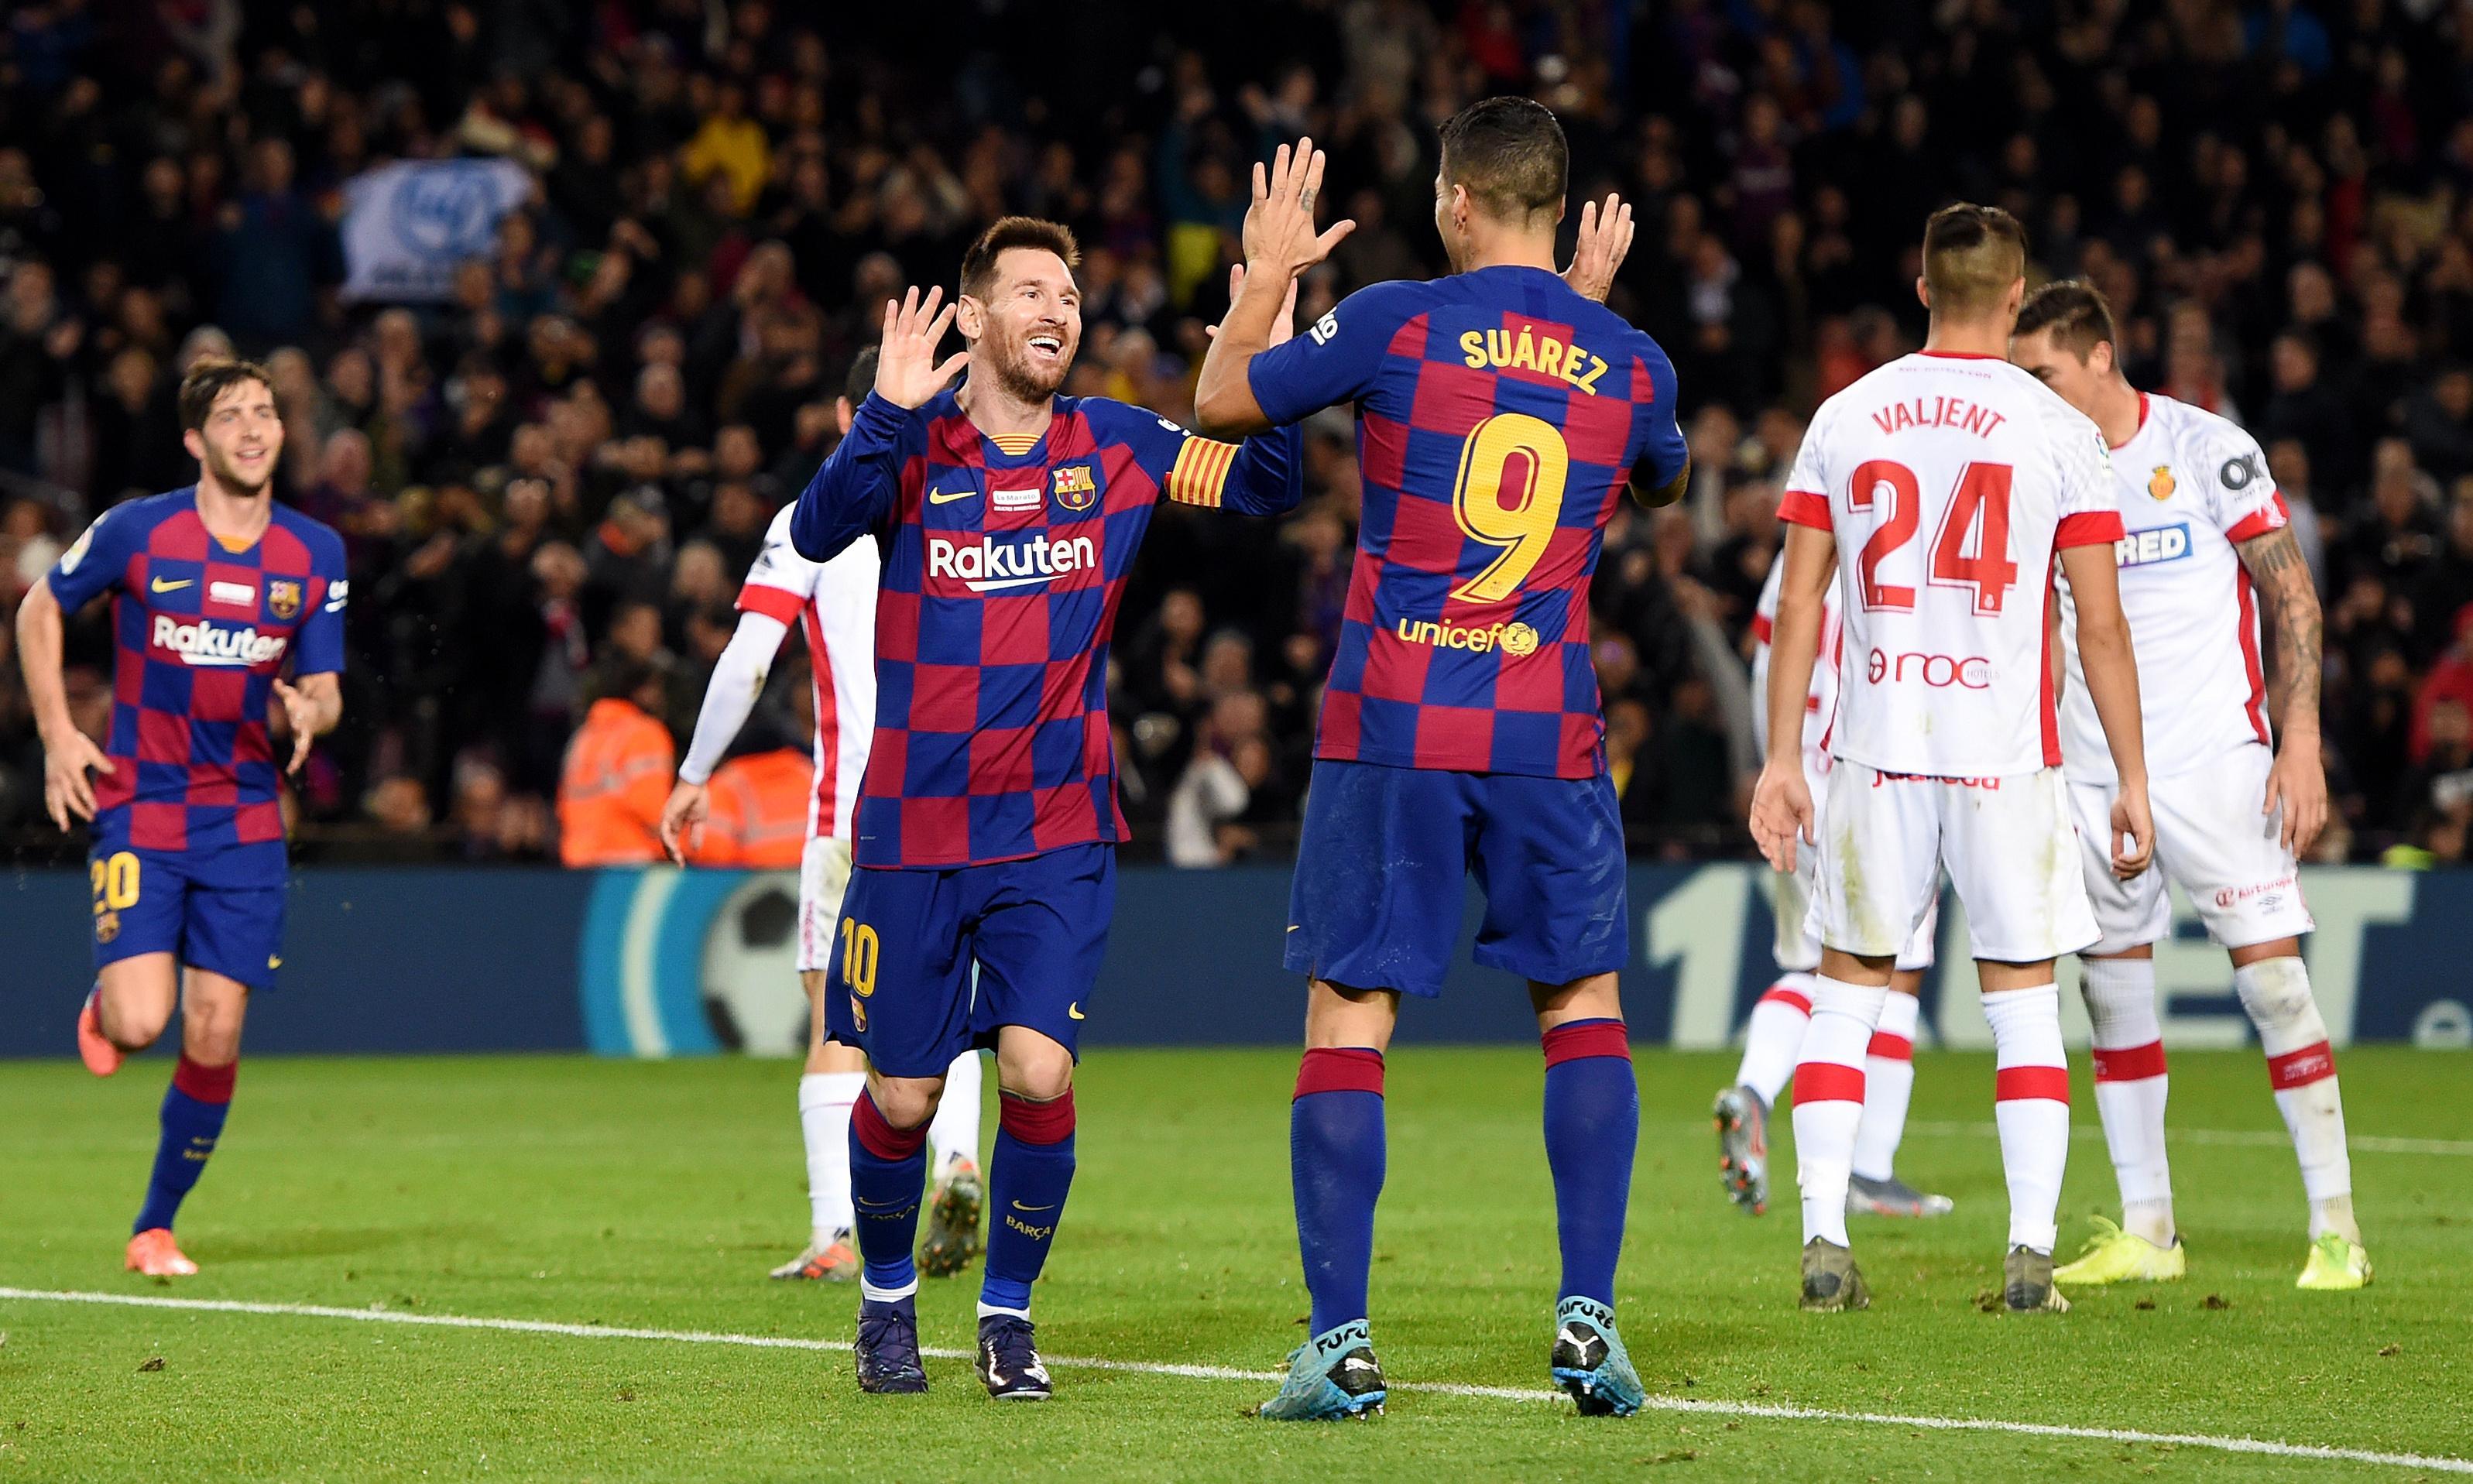 La Liga roundup: Messi masterclass puts Barcelona back on top after Madrid win